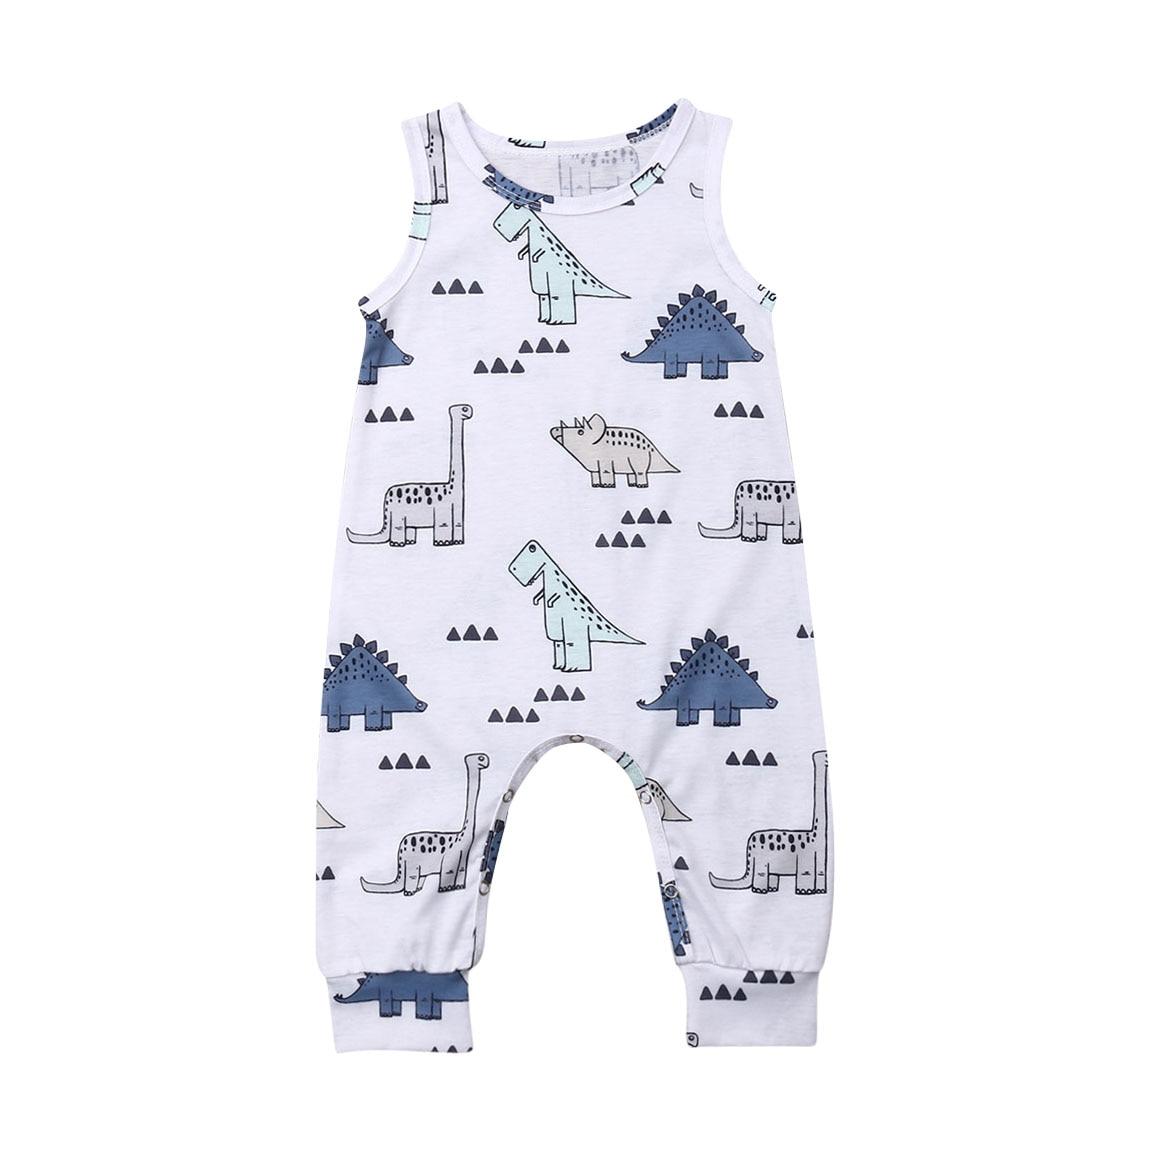 One Piece Newborn Kids Baby Boy Girl Dinosaur Print Sleeveless   Romper   Summer Clothes Outfits Jumpsuit